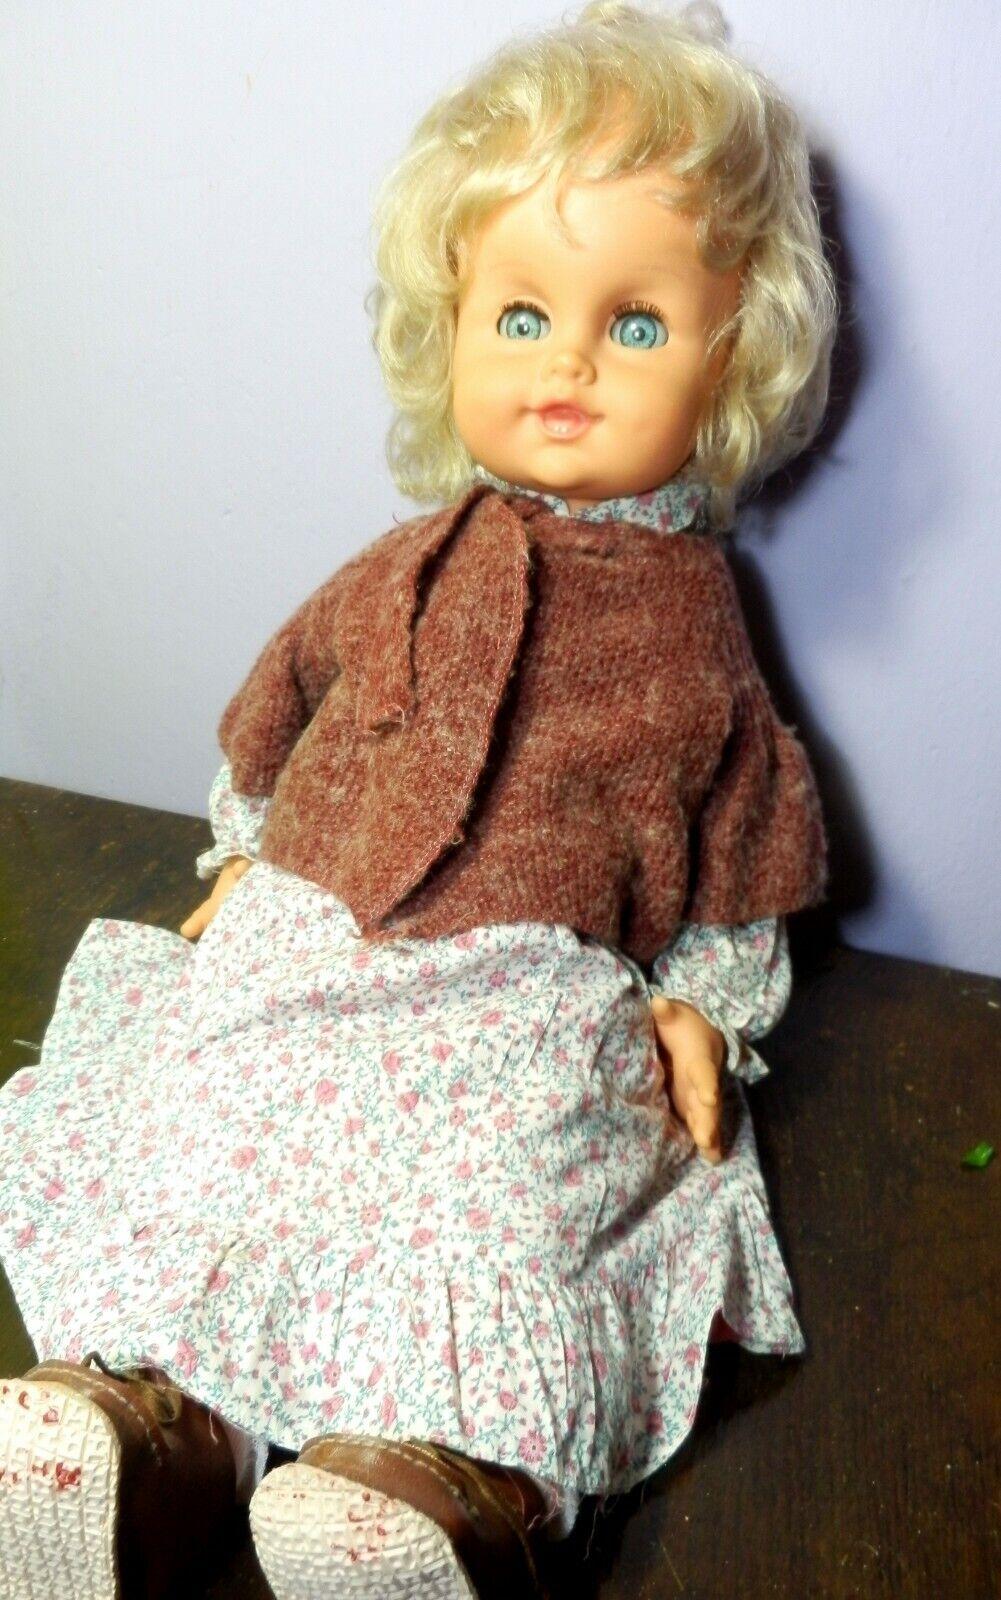 Patatina Sebino tutta Originale doll poupee puppen Muneca Vintage antico